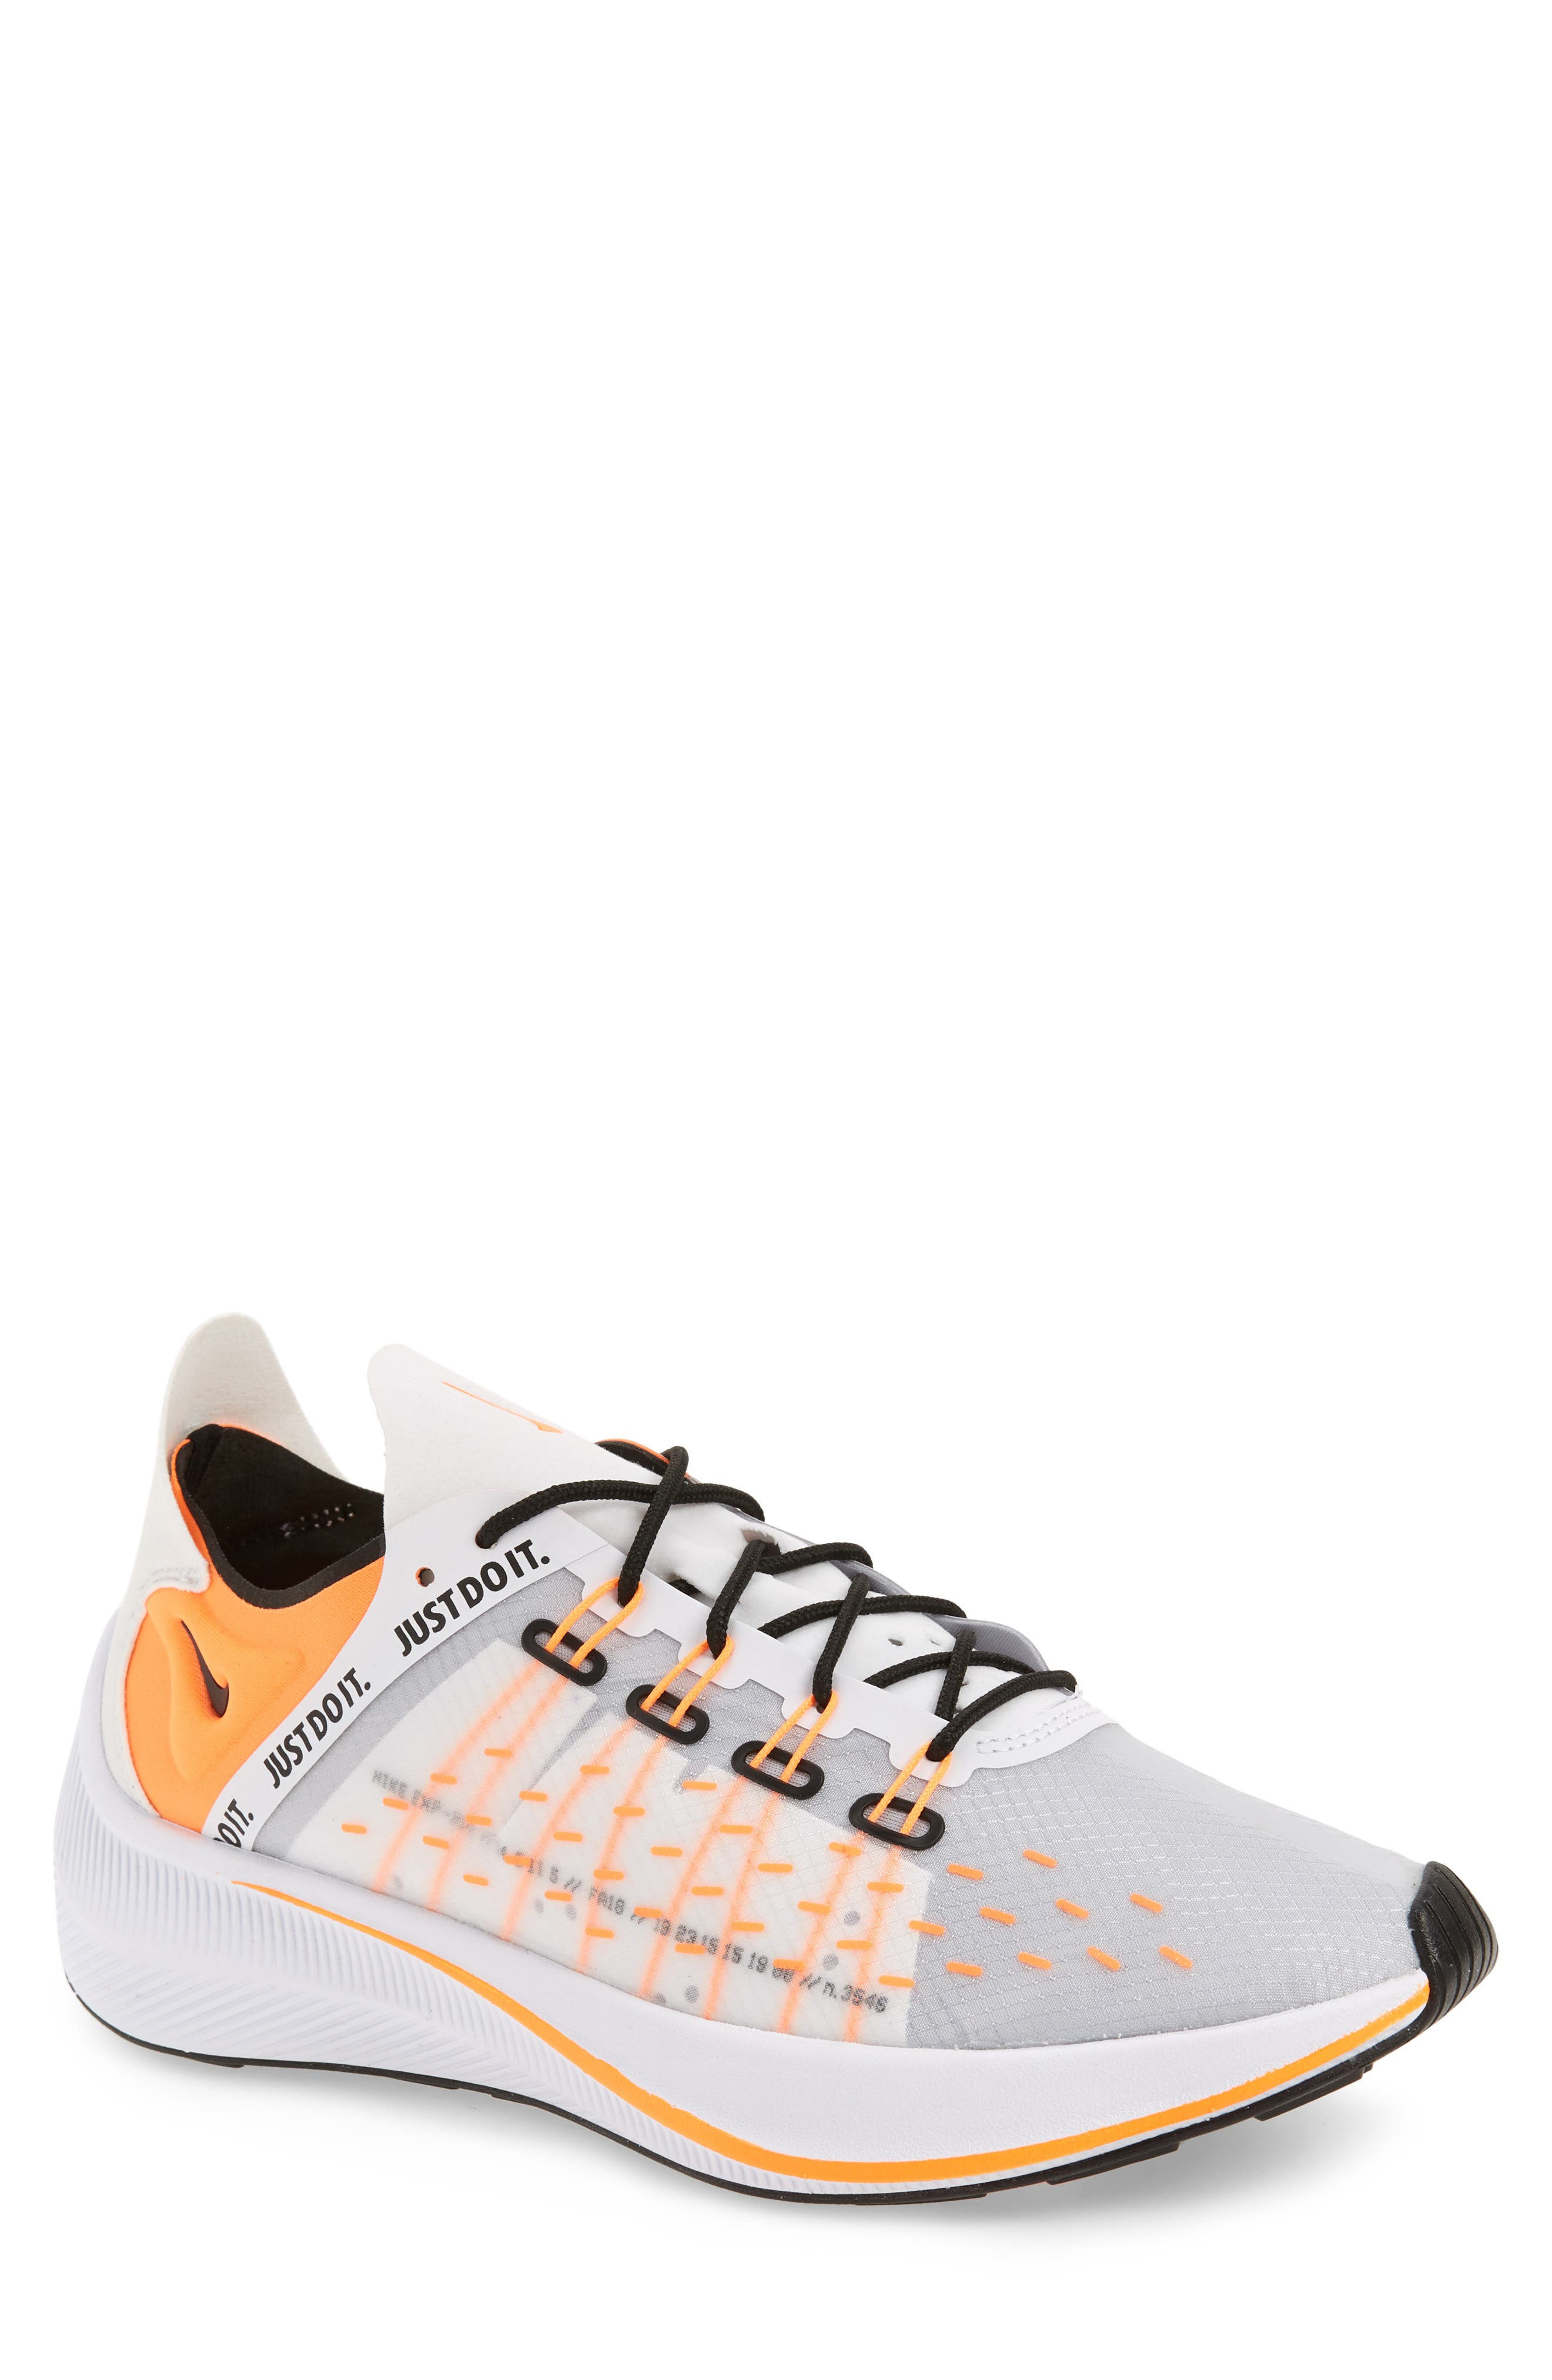 EXP-X14 Just Do It Sneaker,                             Main thumbnail 1, color,                             WHITE/ TOTAL ORANGE/ BLACK